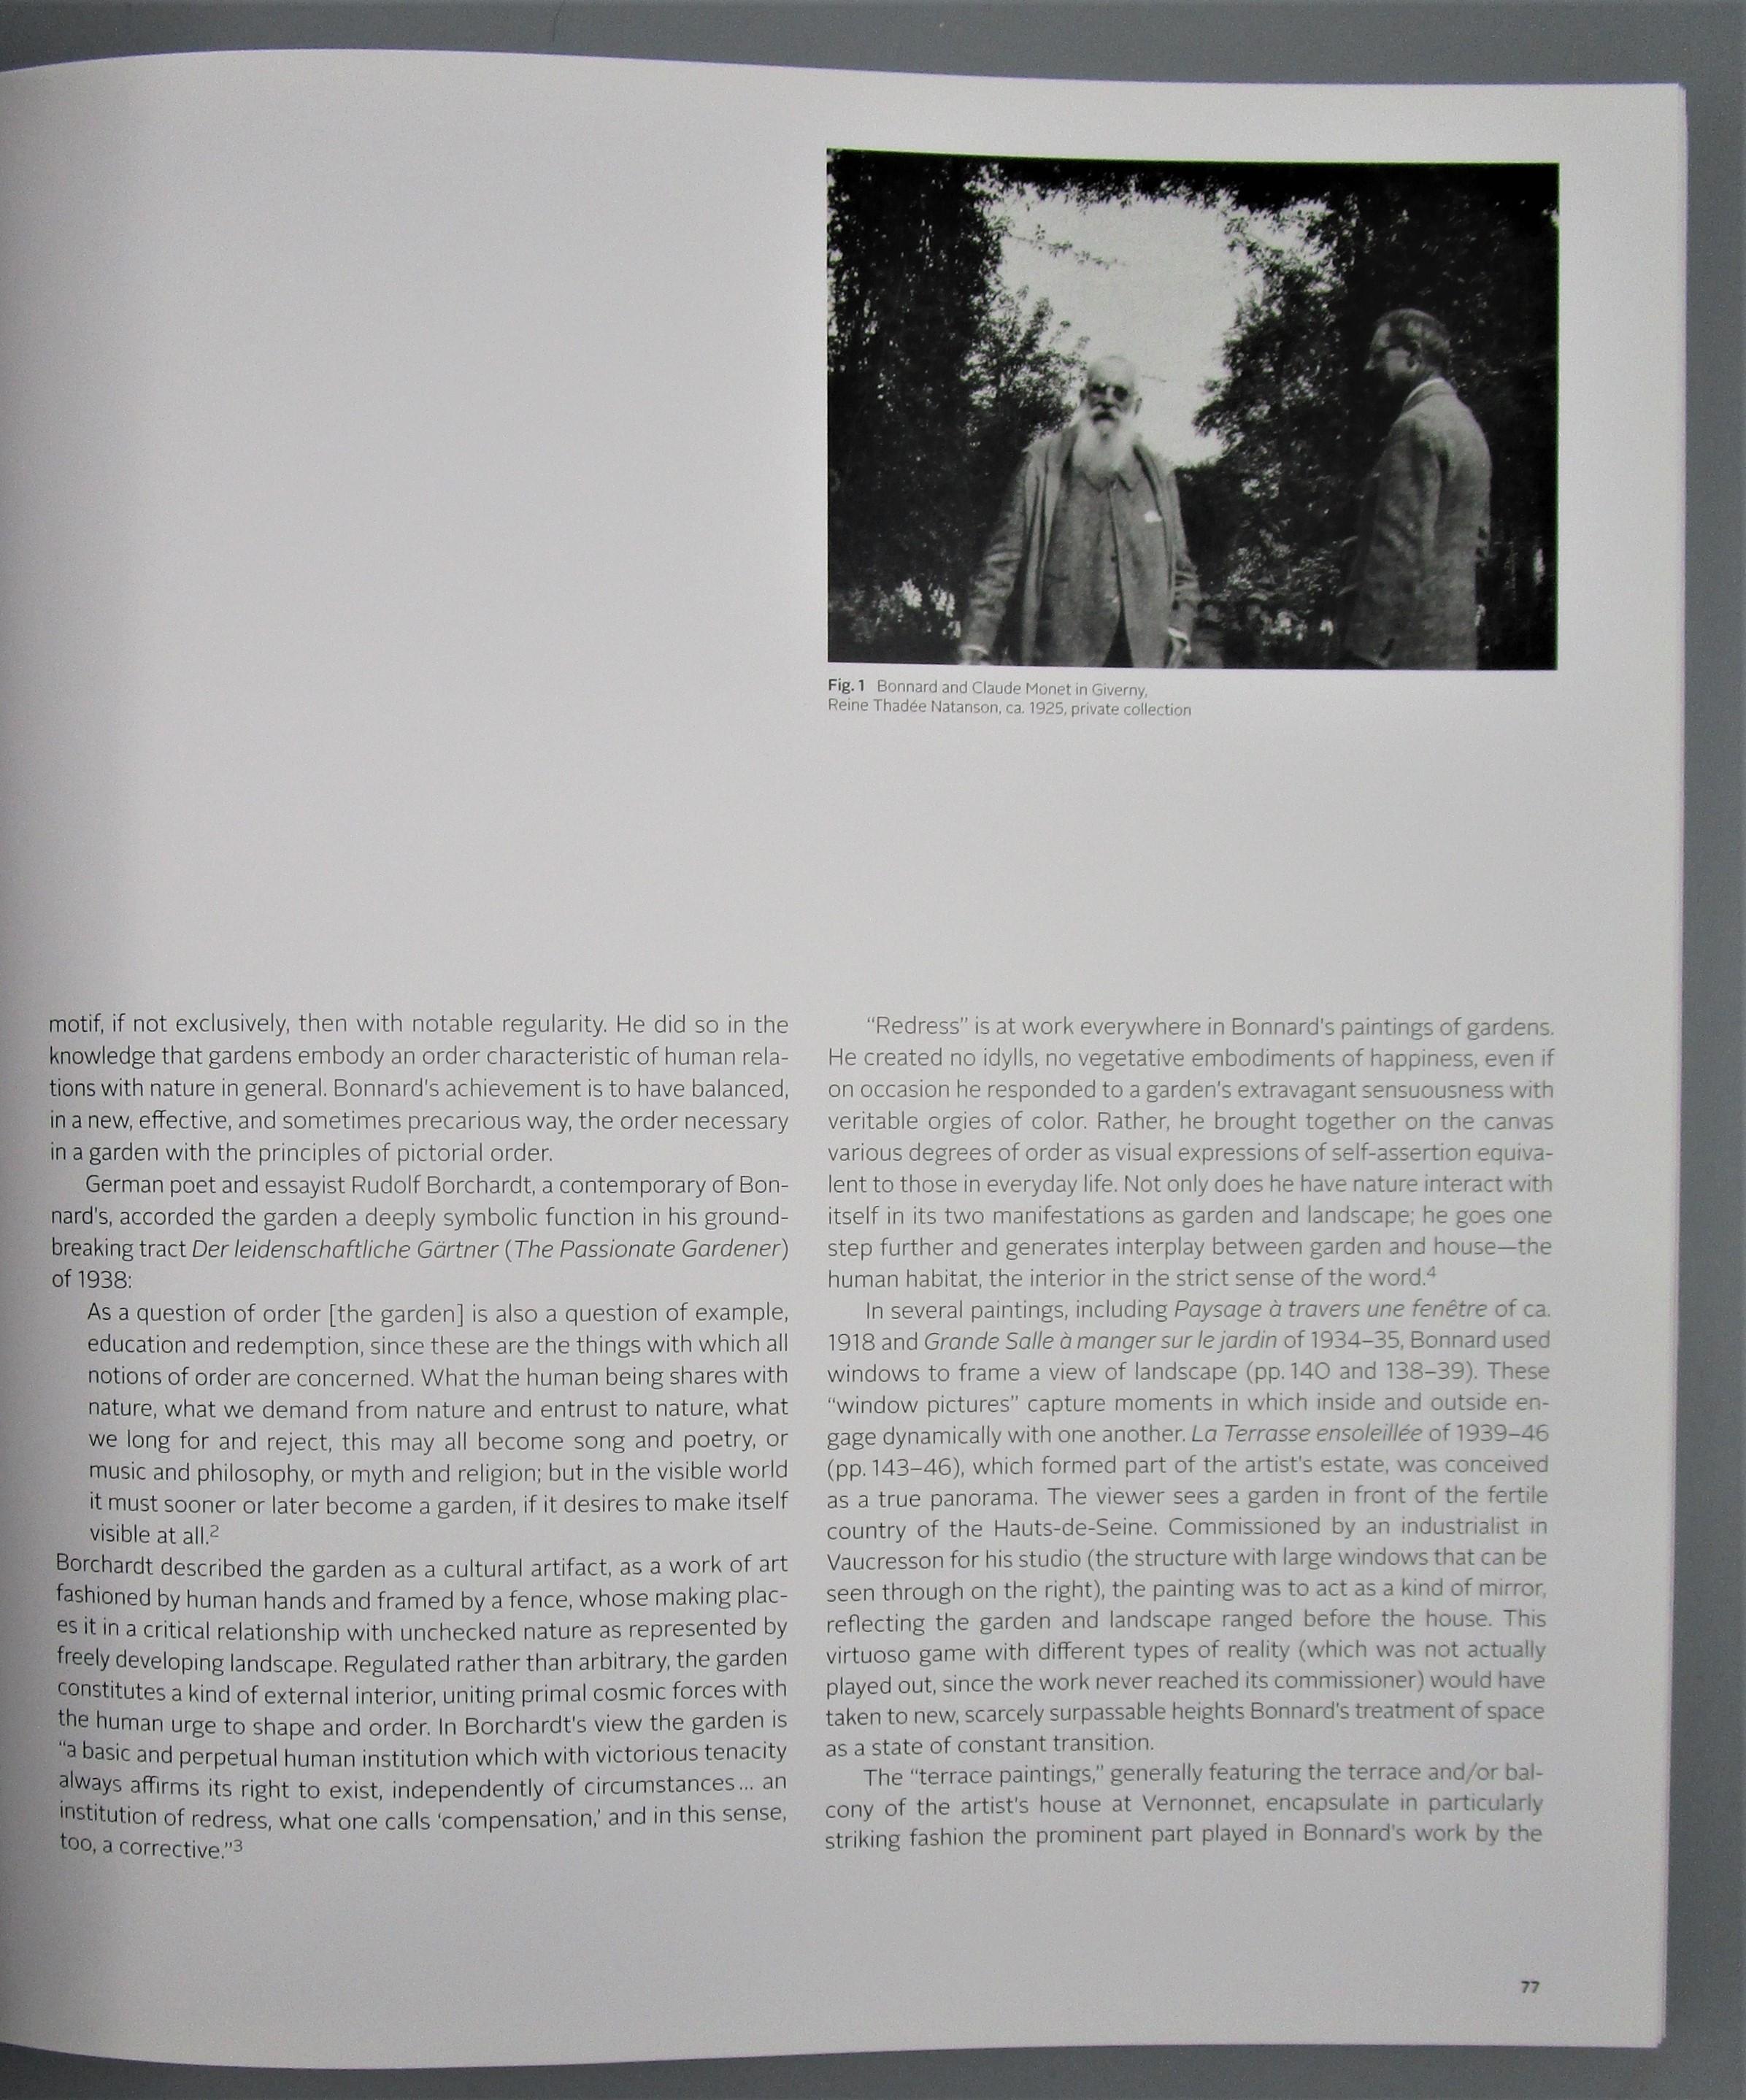 PIERRE BONNARD, by Fondation Beyeler - 2012